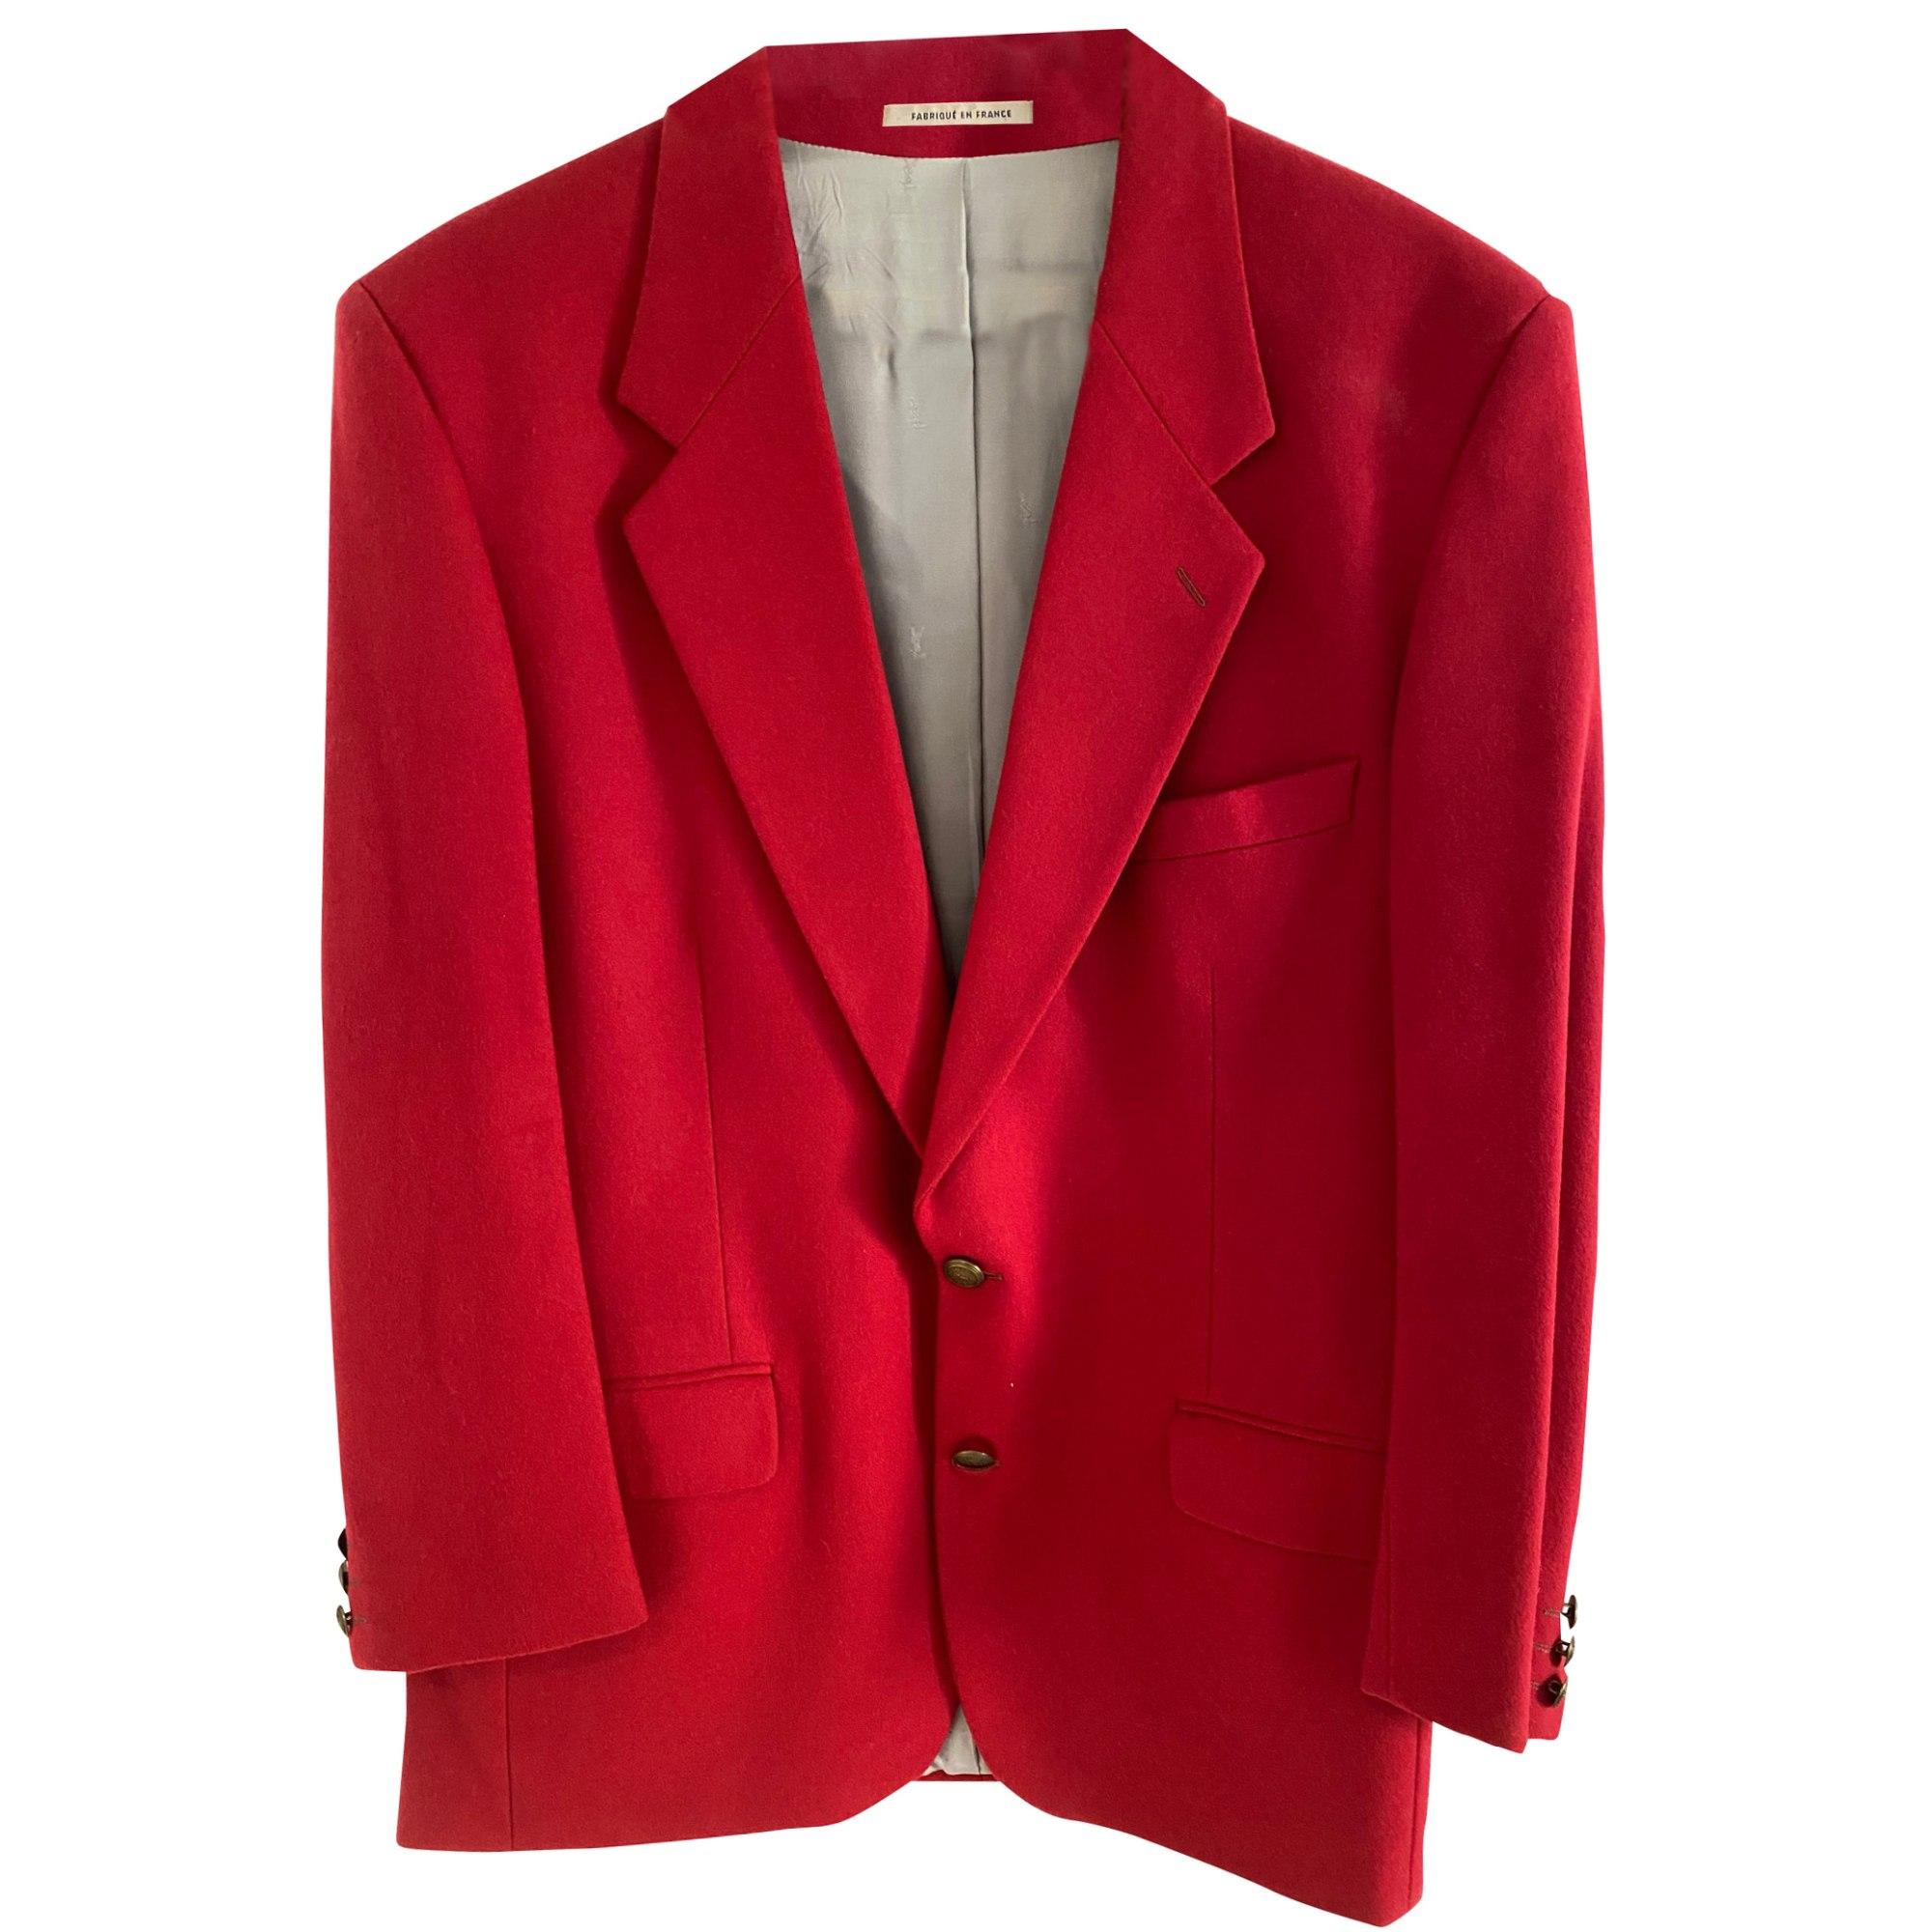 Suit Jacket YVES SAINT LAURENT Red, burgundy